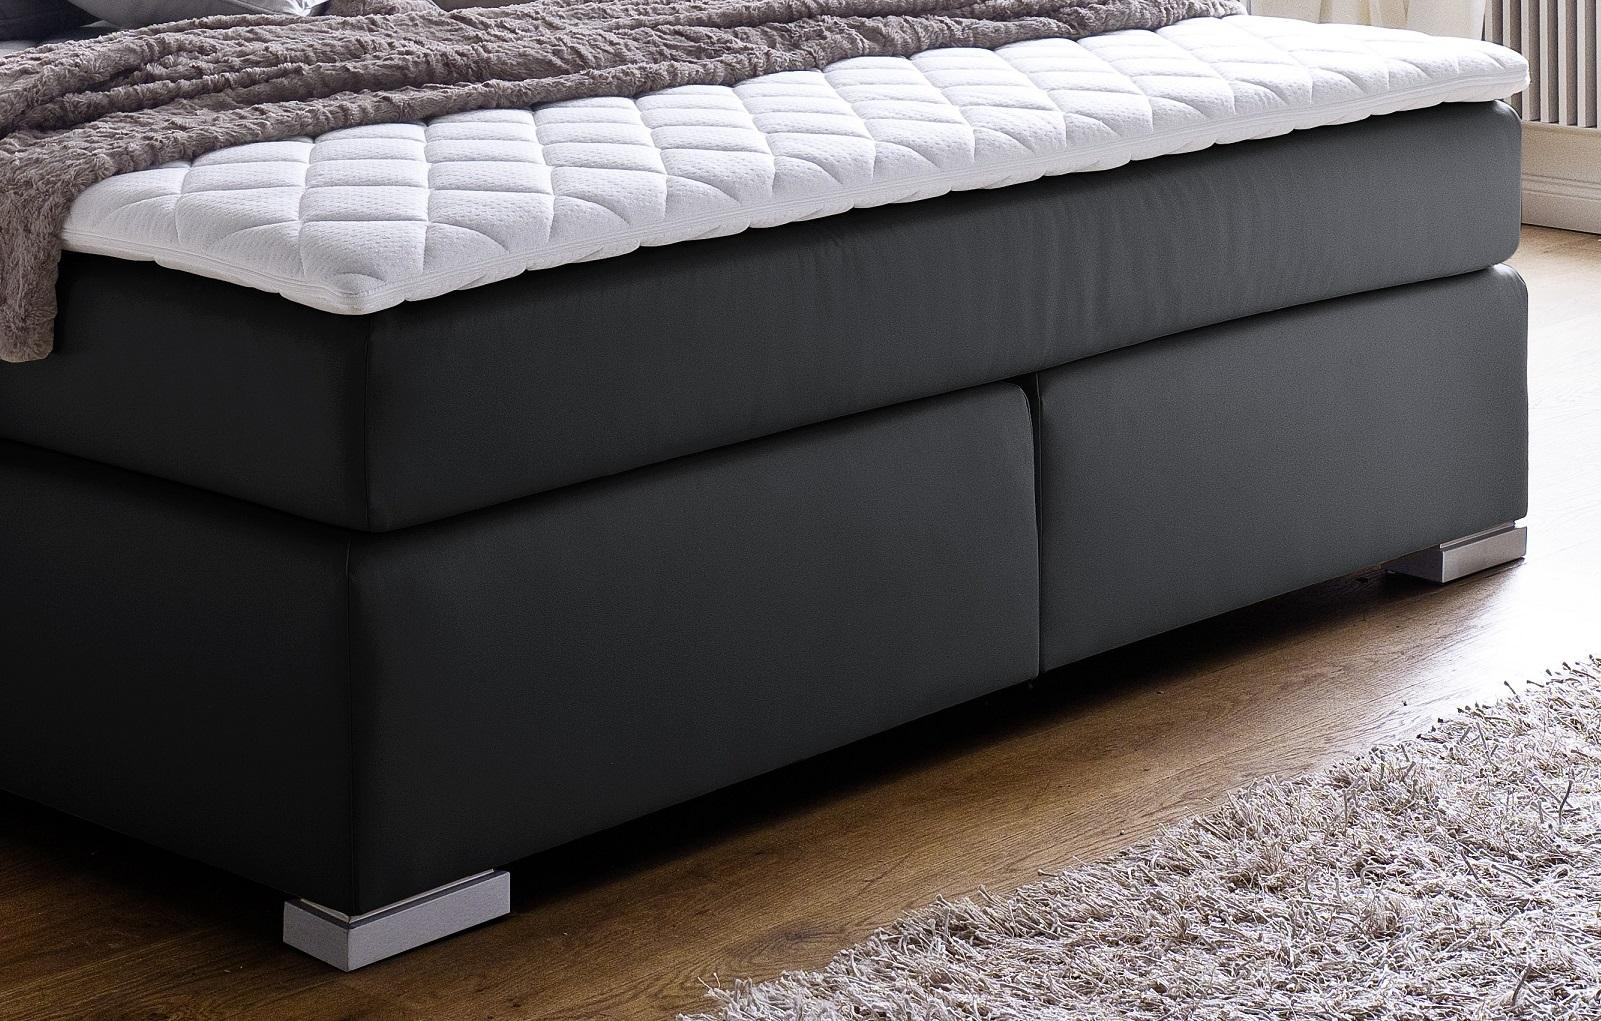 boxspringbett isabelle schwarz 200cm x 200cm. Black Bedroom Furniture Sets. Home Design Ideas